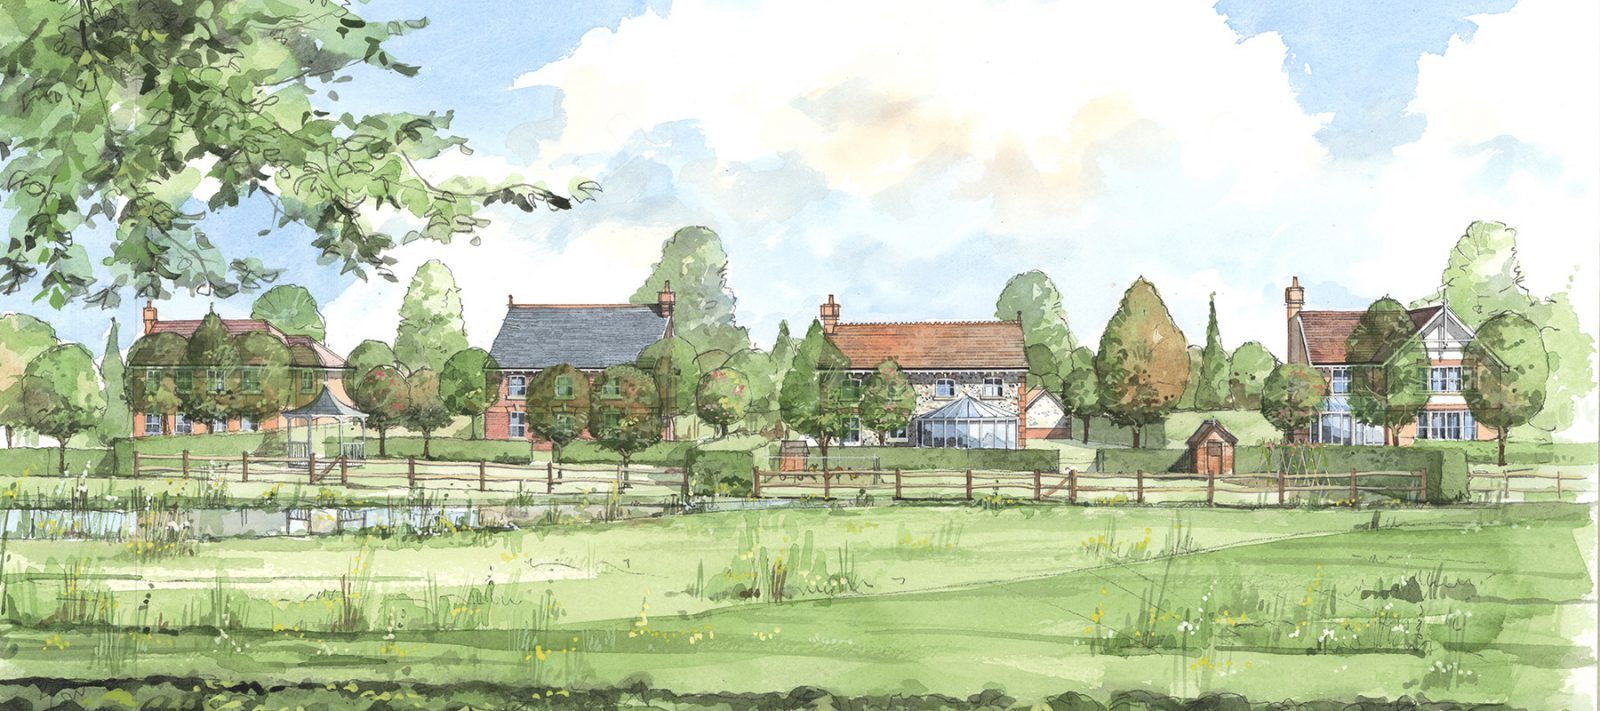 Chilmington Green, Kent